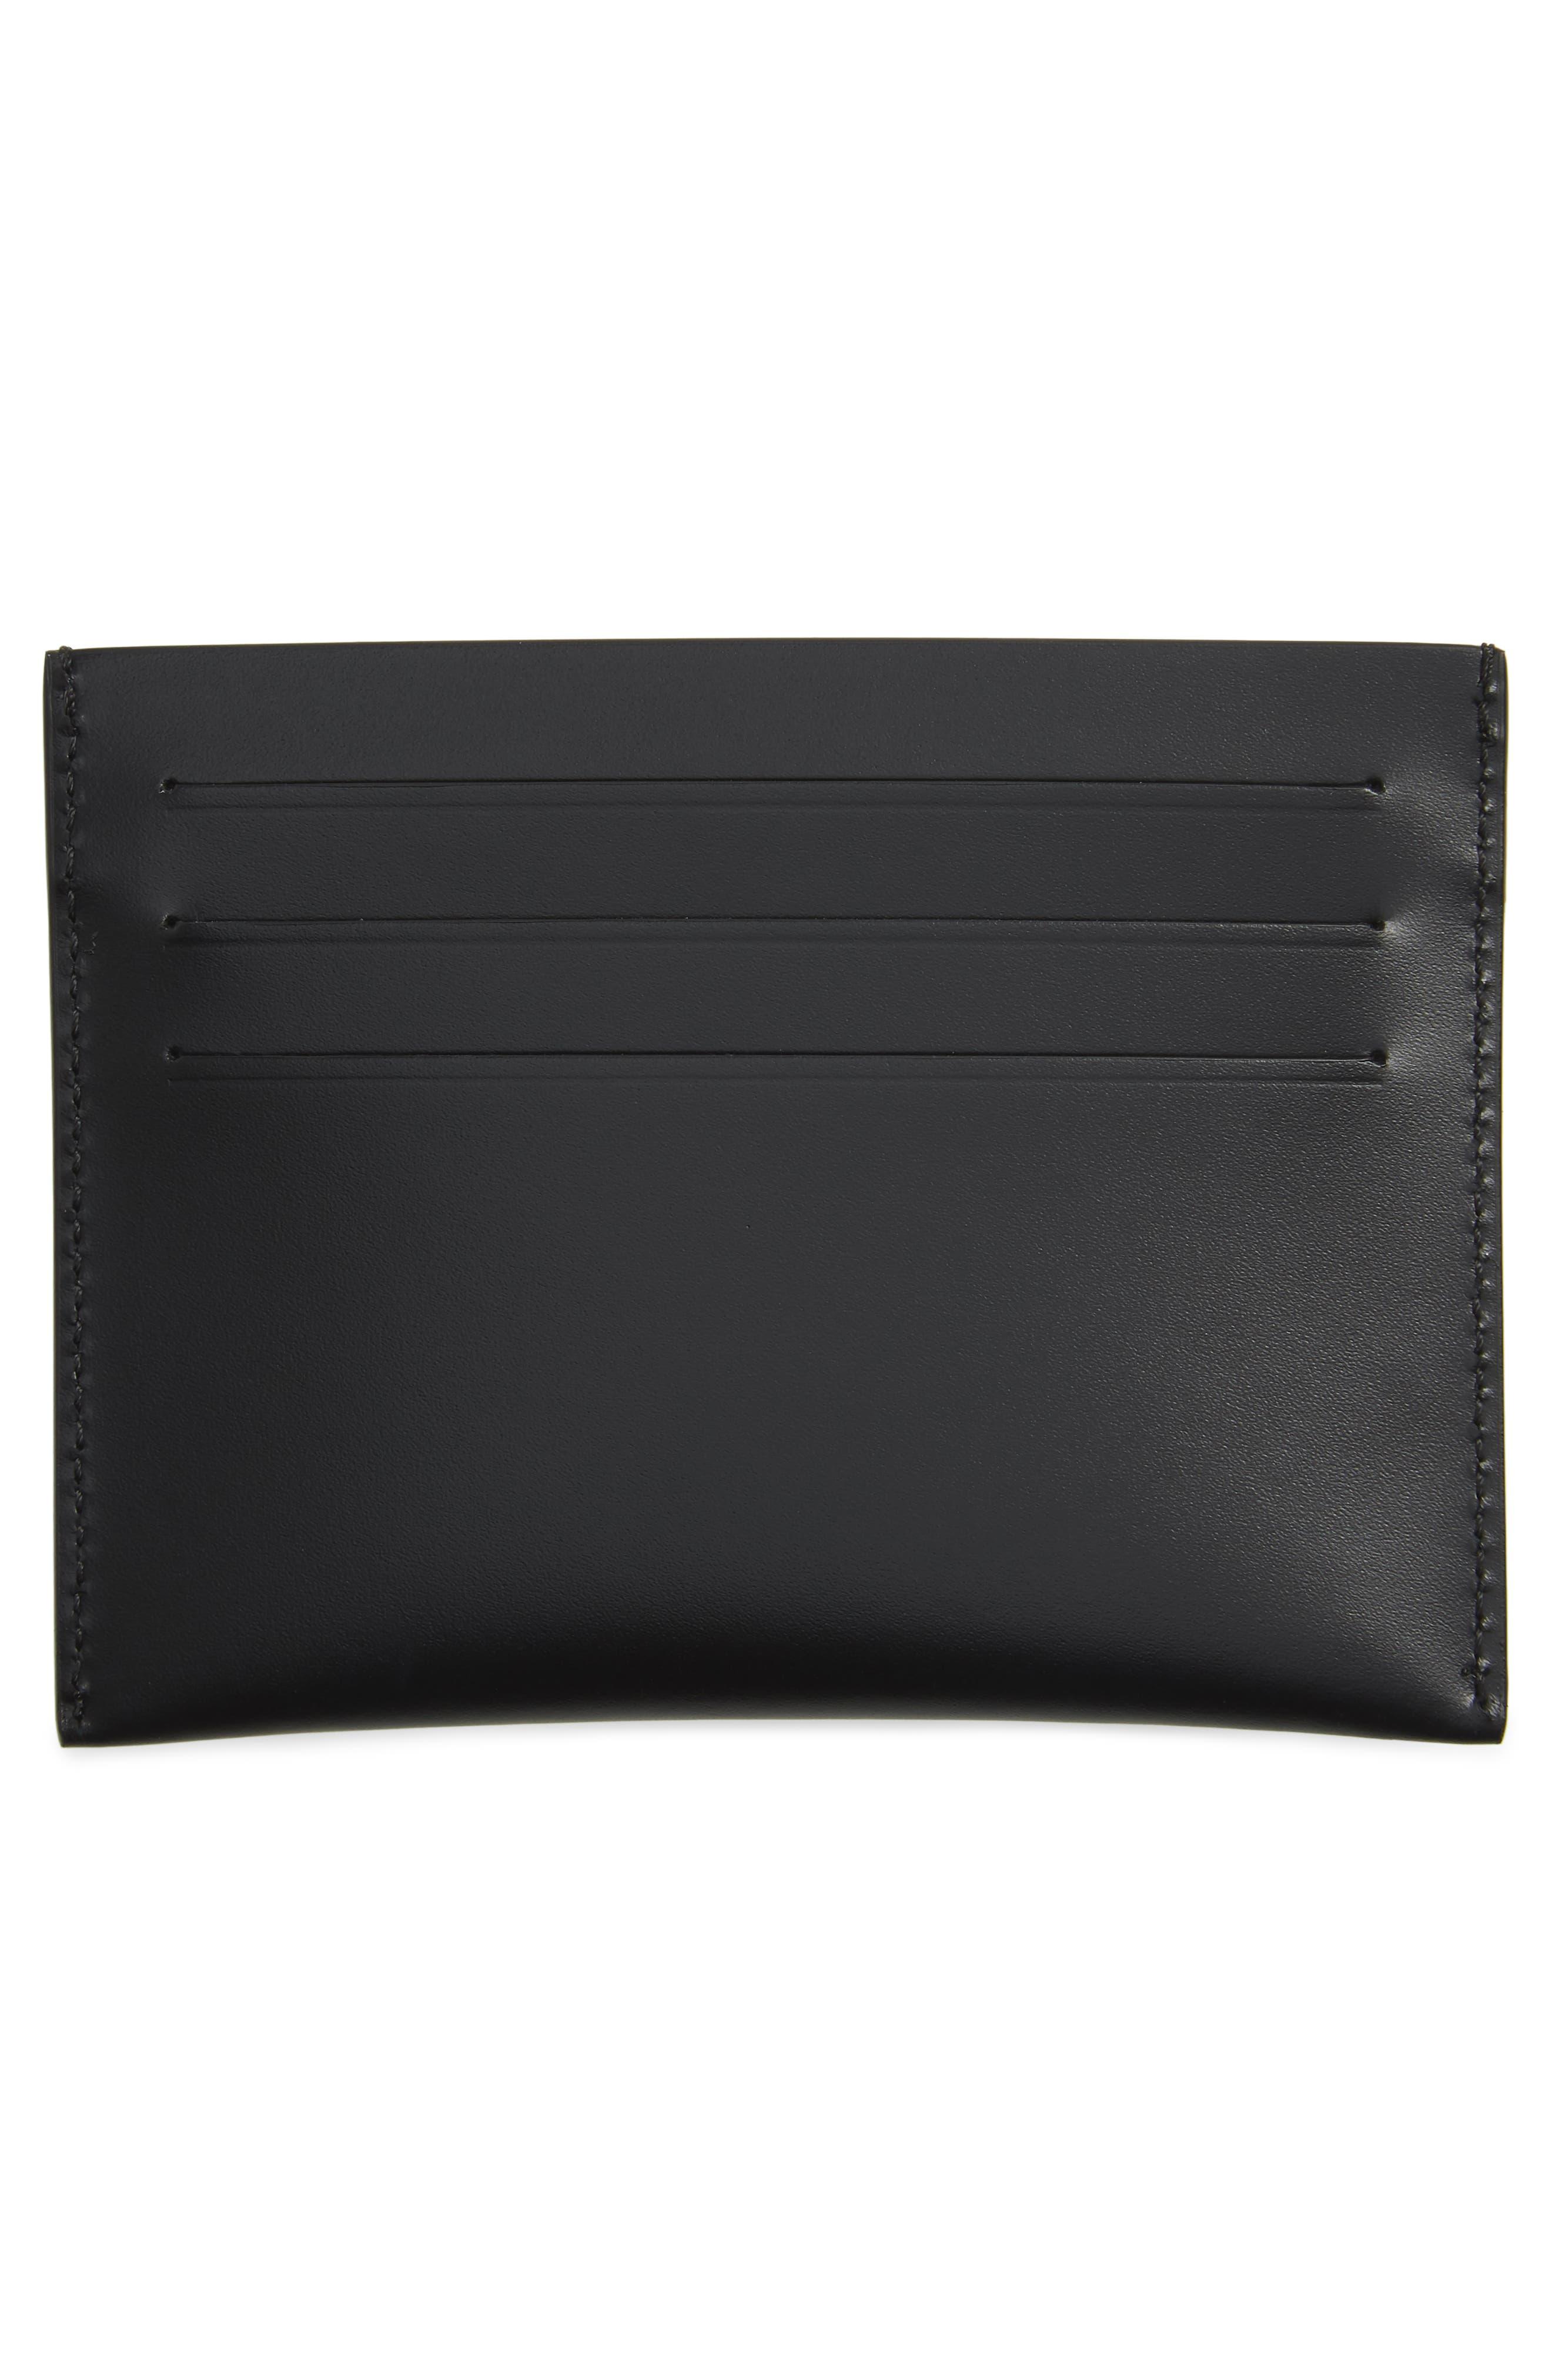 Iris Logo Print Calfskin Leather Card Case,                             Alternate thumbnail 3, color,                             Black/ Red